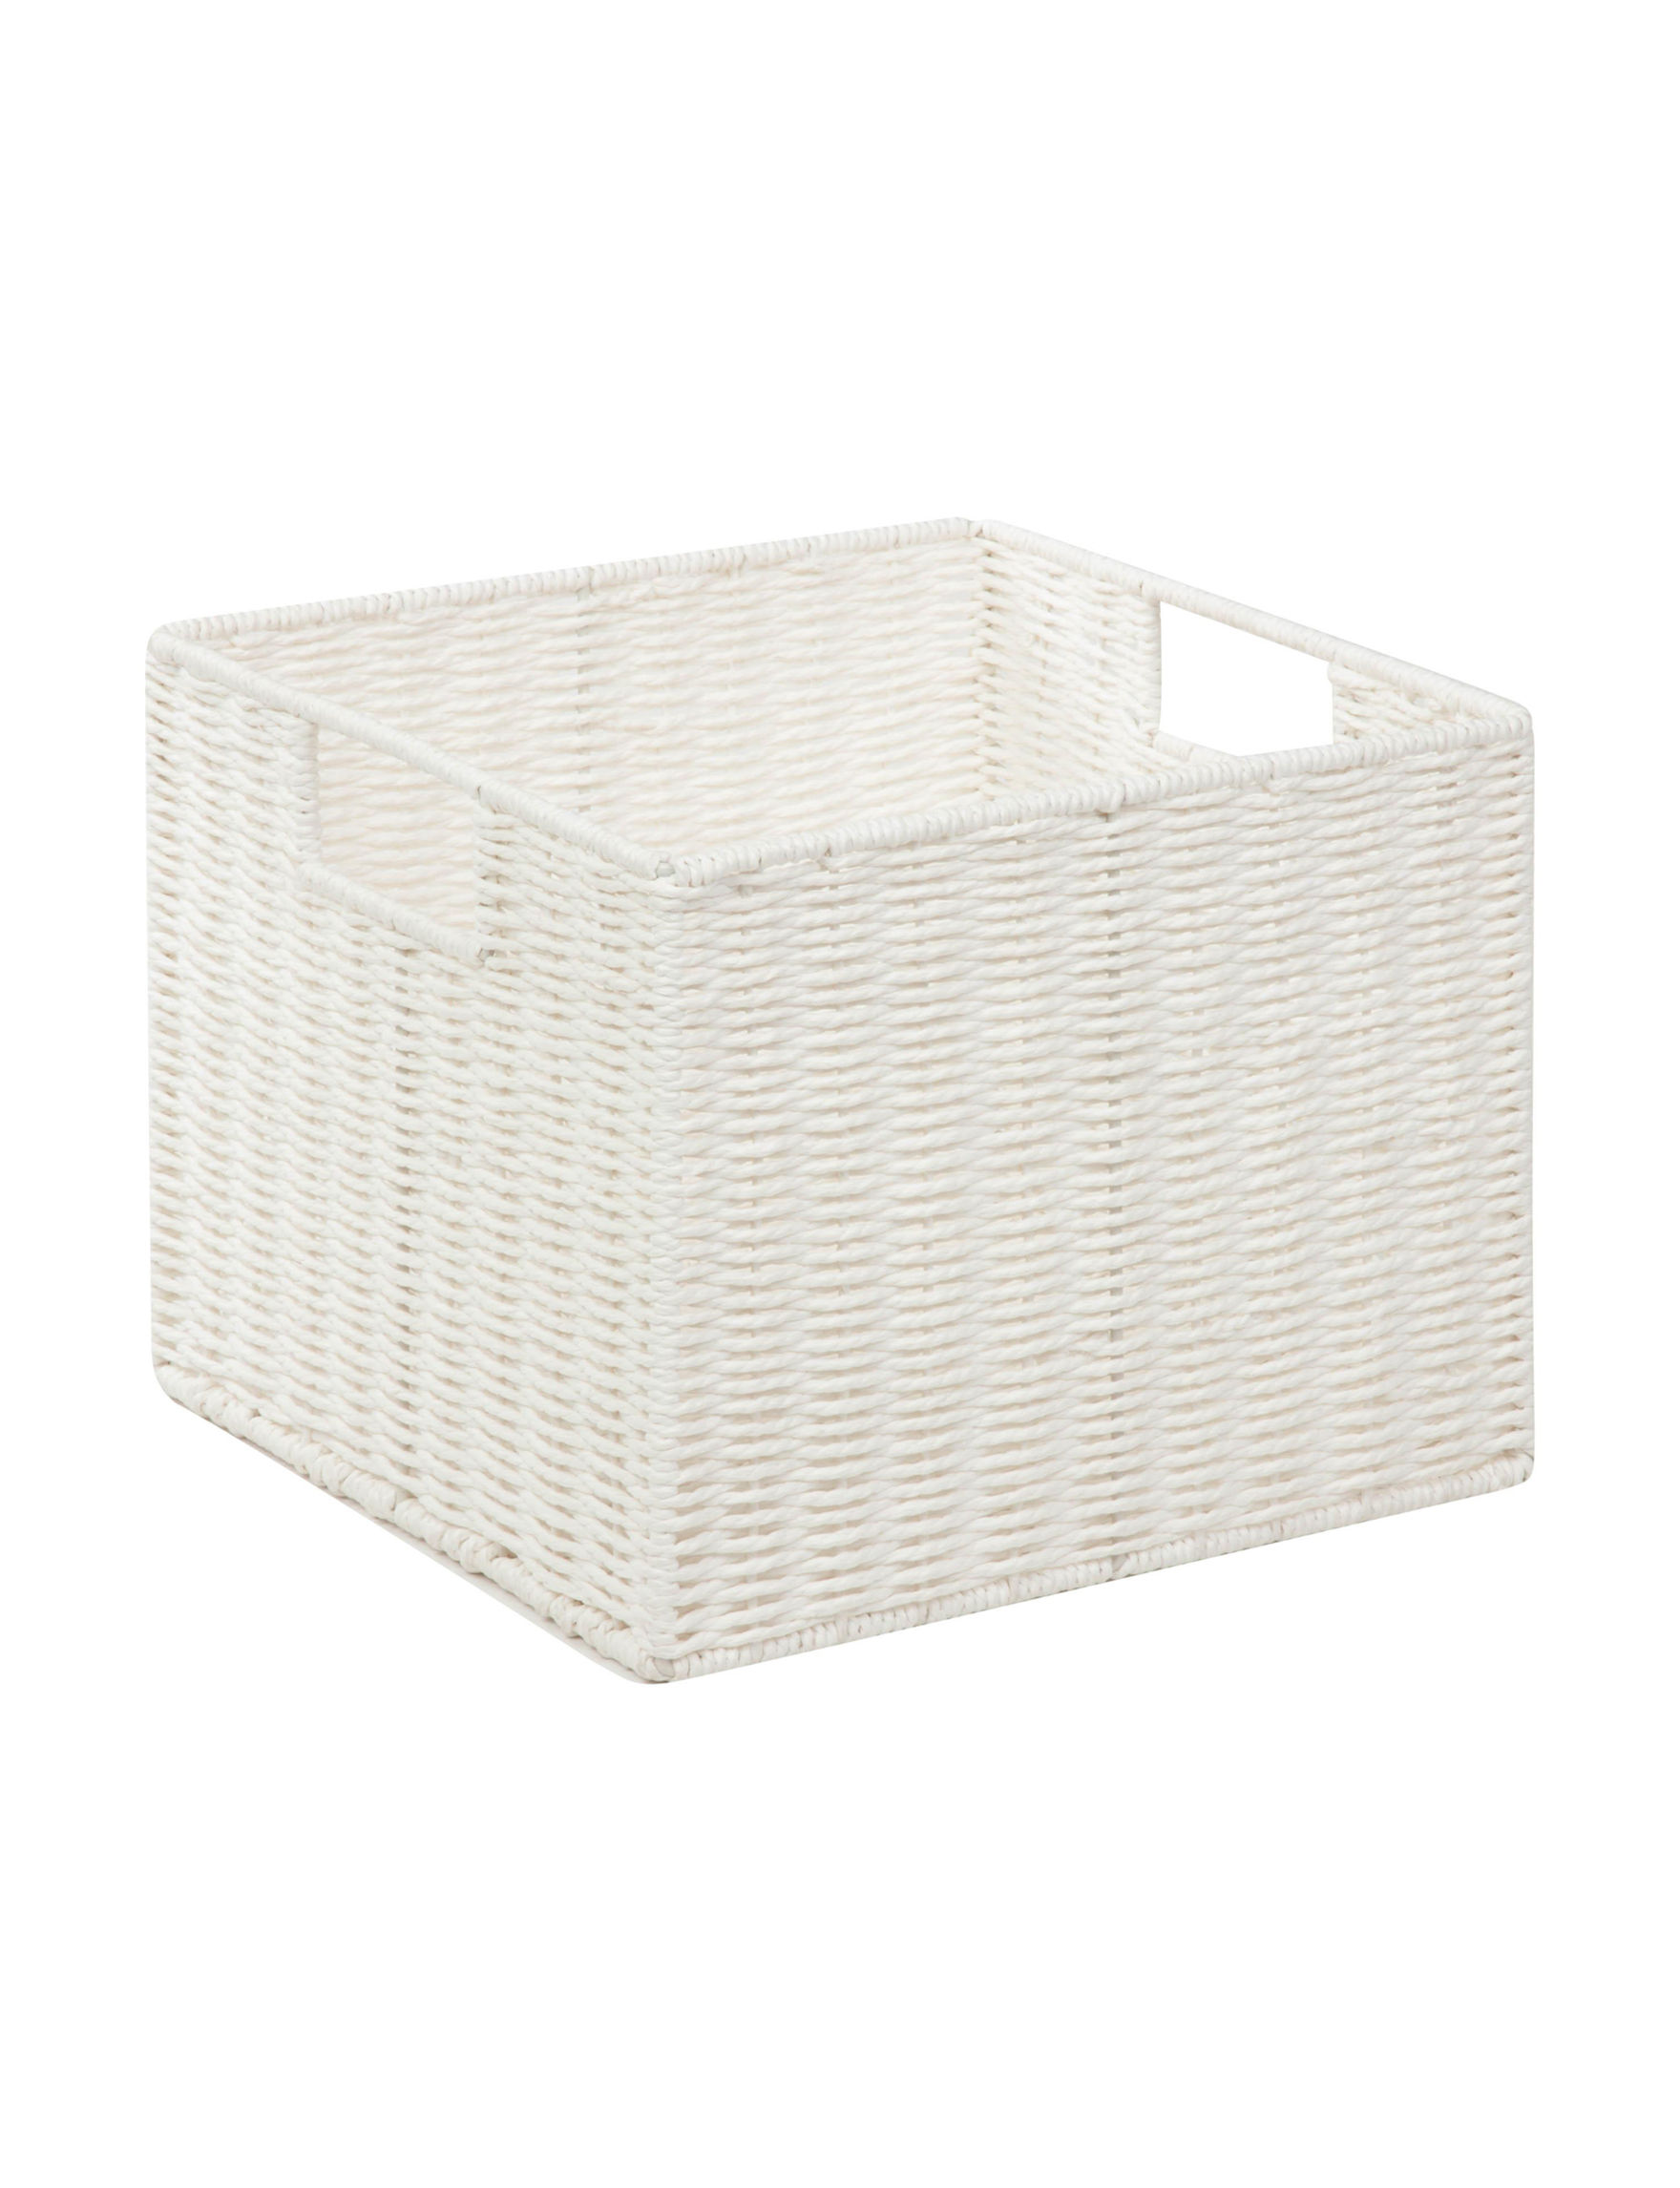 Honey-Can-Do International White Storage & Organization